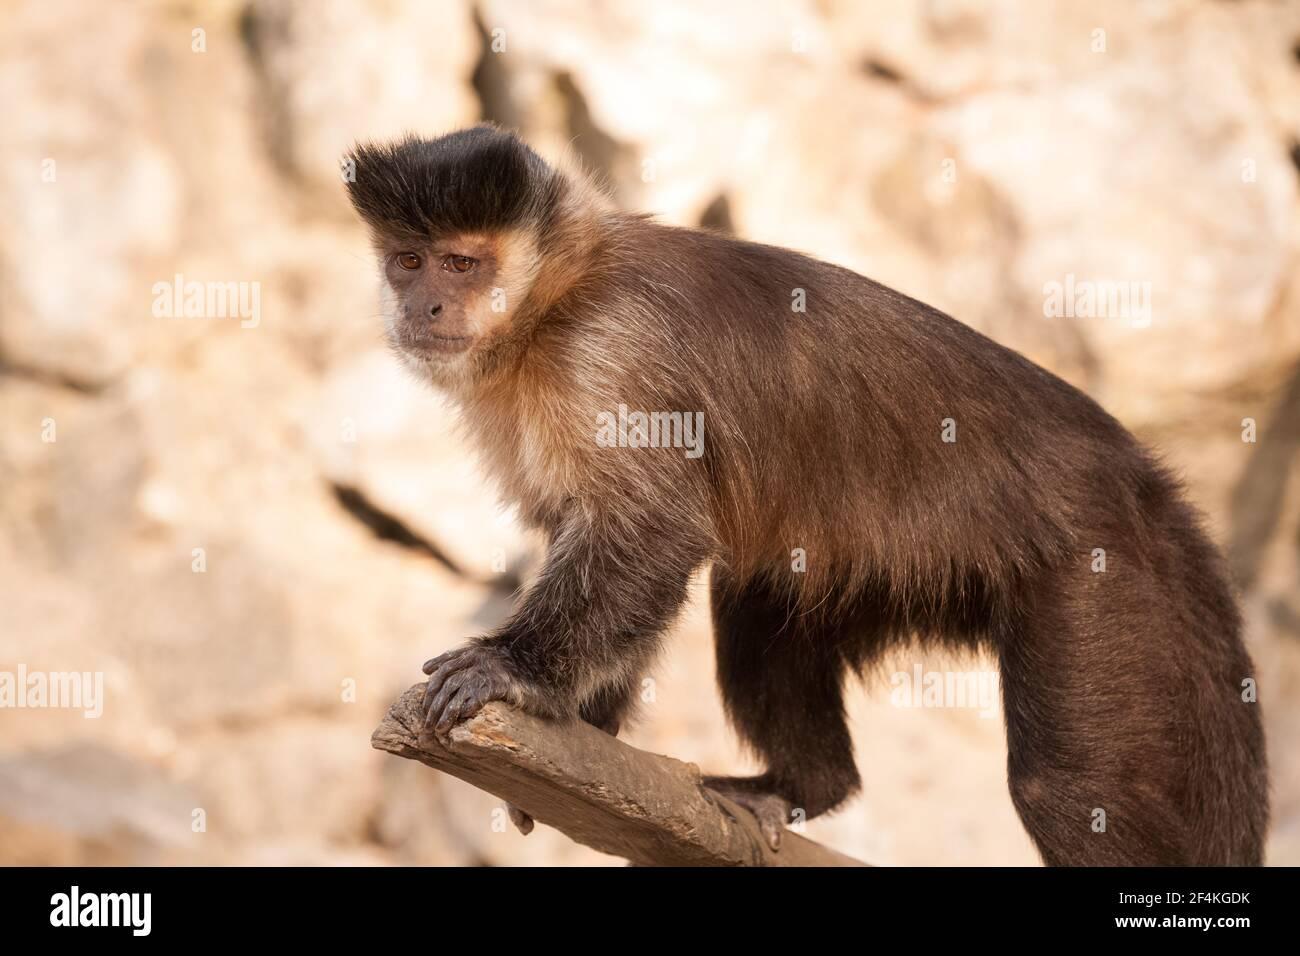 Capuchin sweet little monkey on the branch Stock Photo